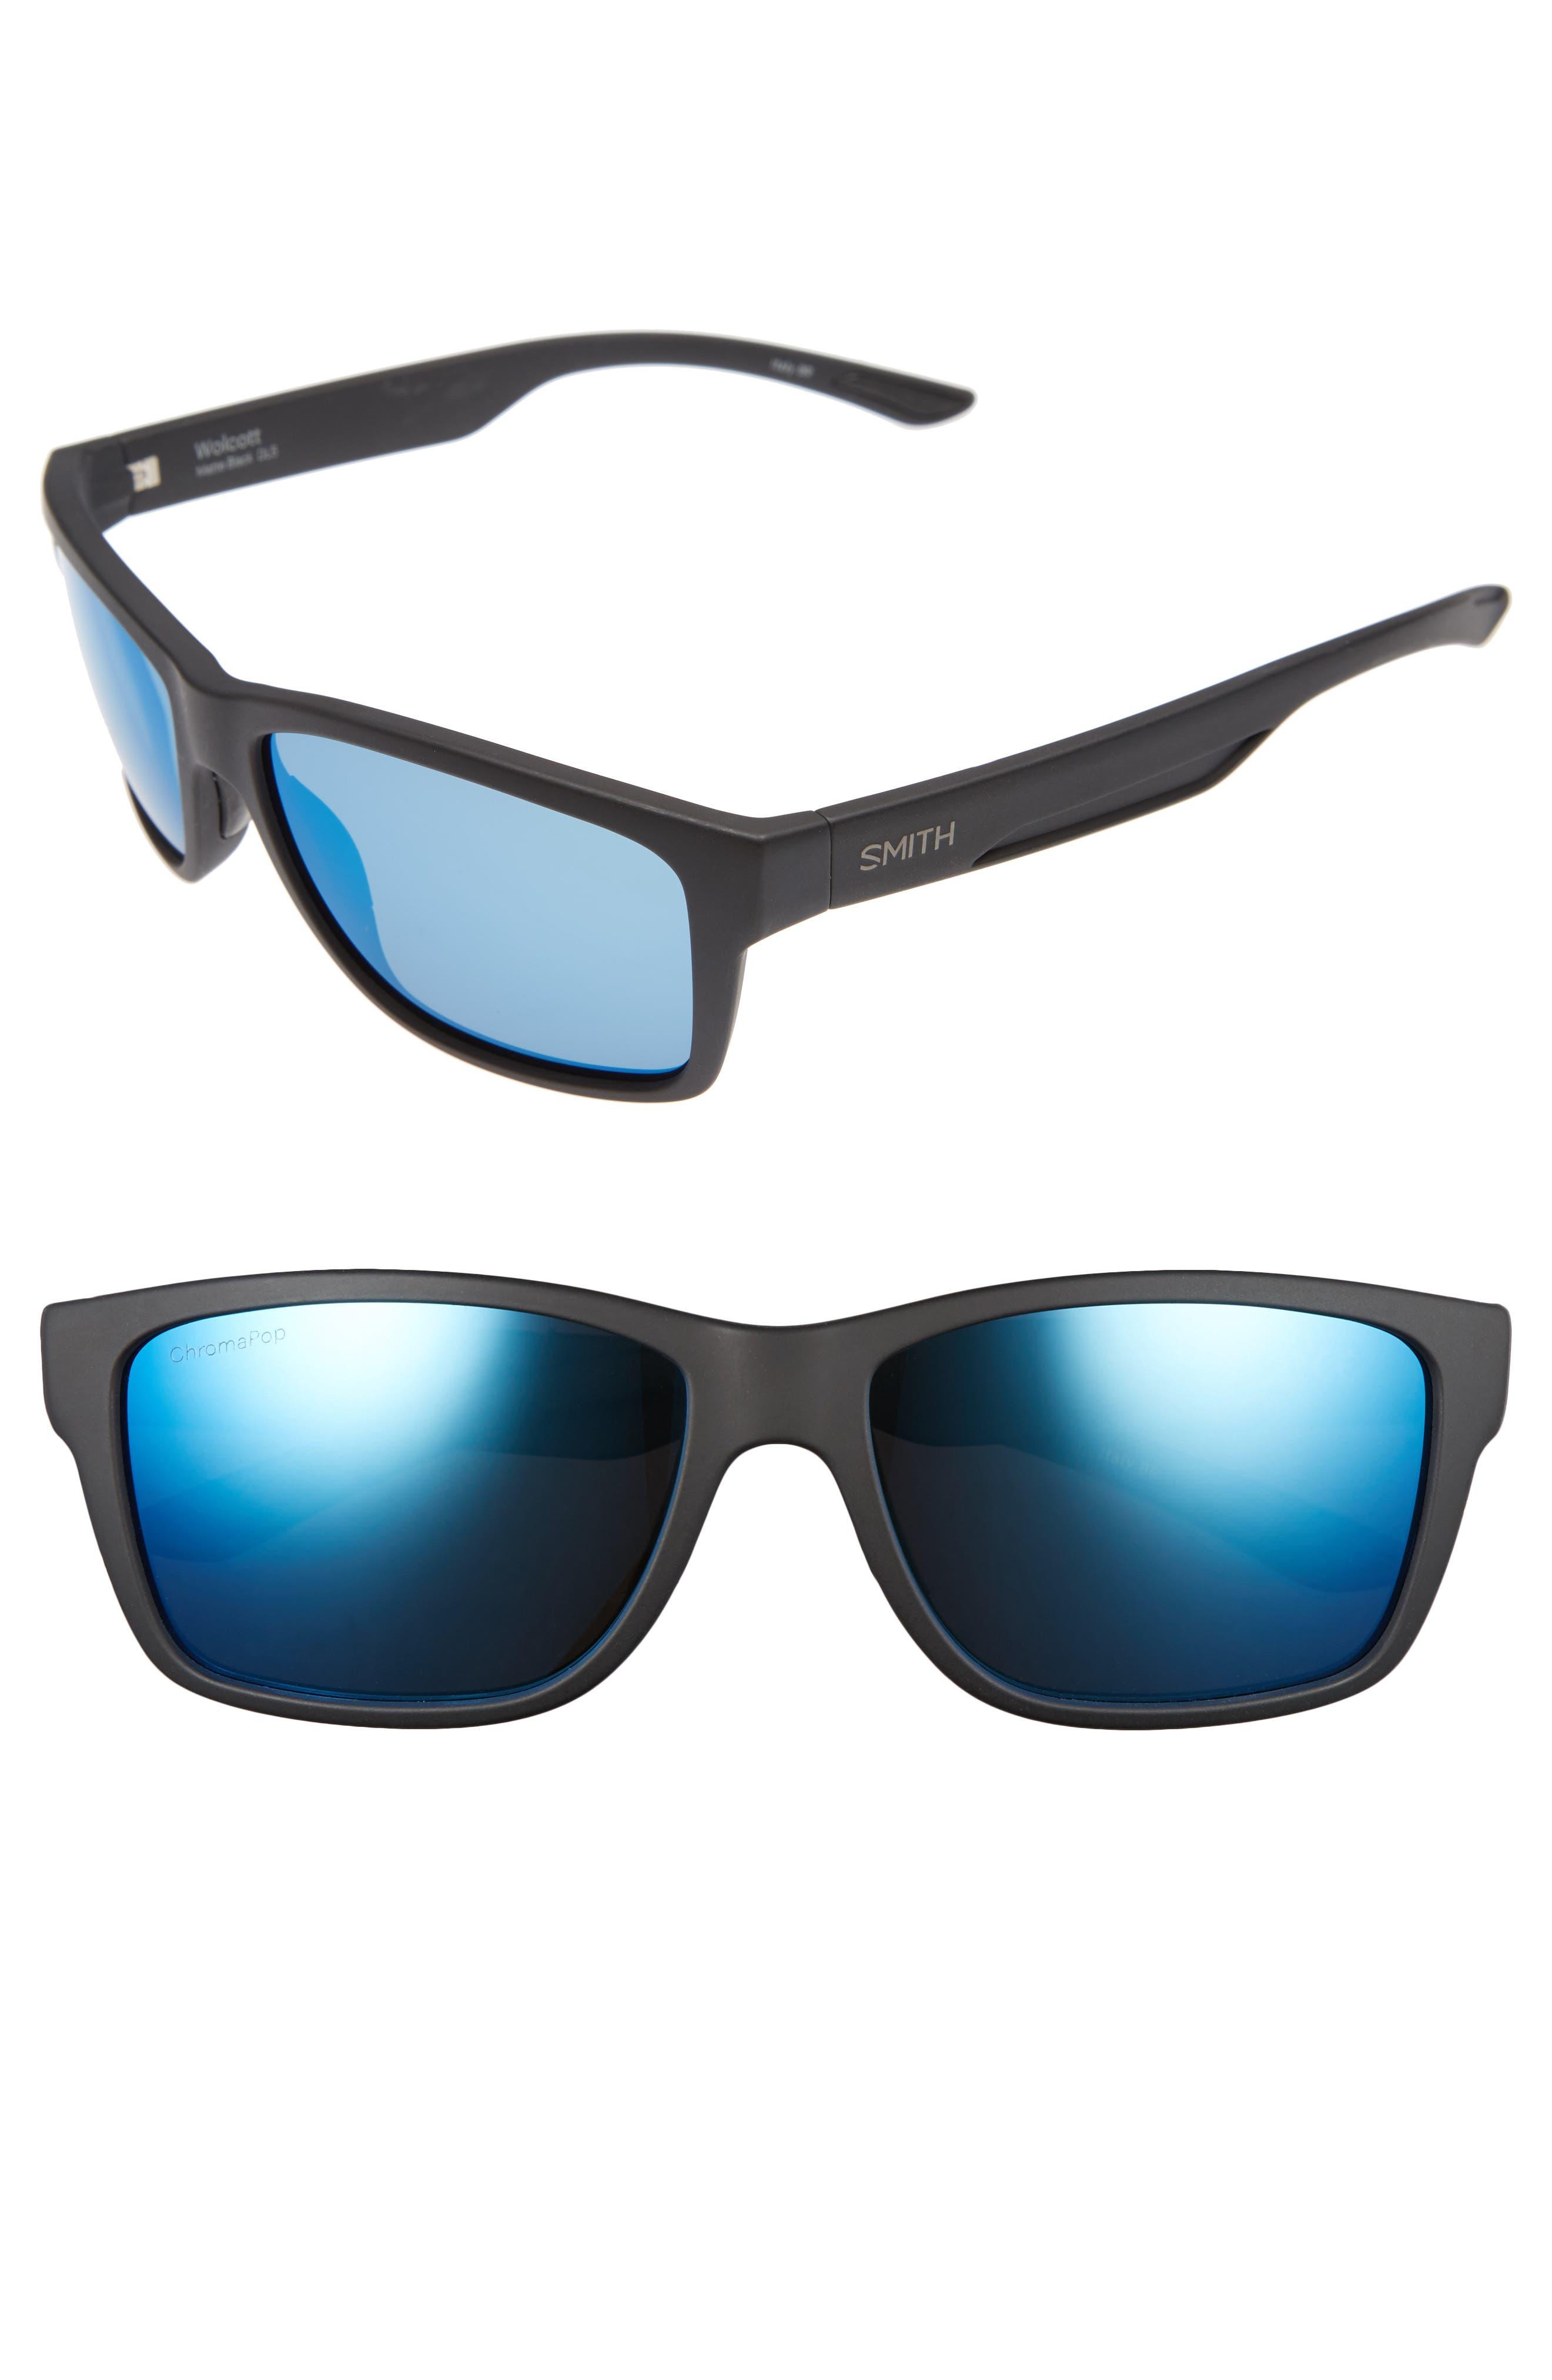 Wolcott 58mm Polarized Sunglasses,                             Main thumbnail 1, color,                             MATTE BLACK/ BLUE MIRROR LENS